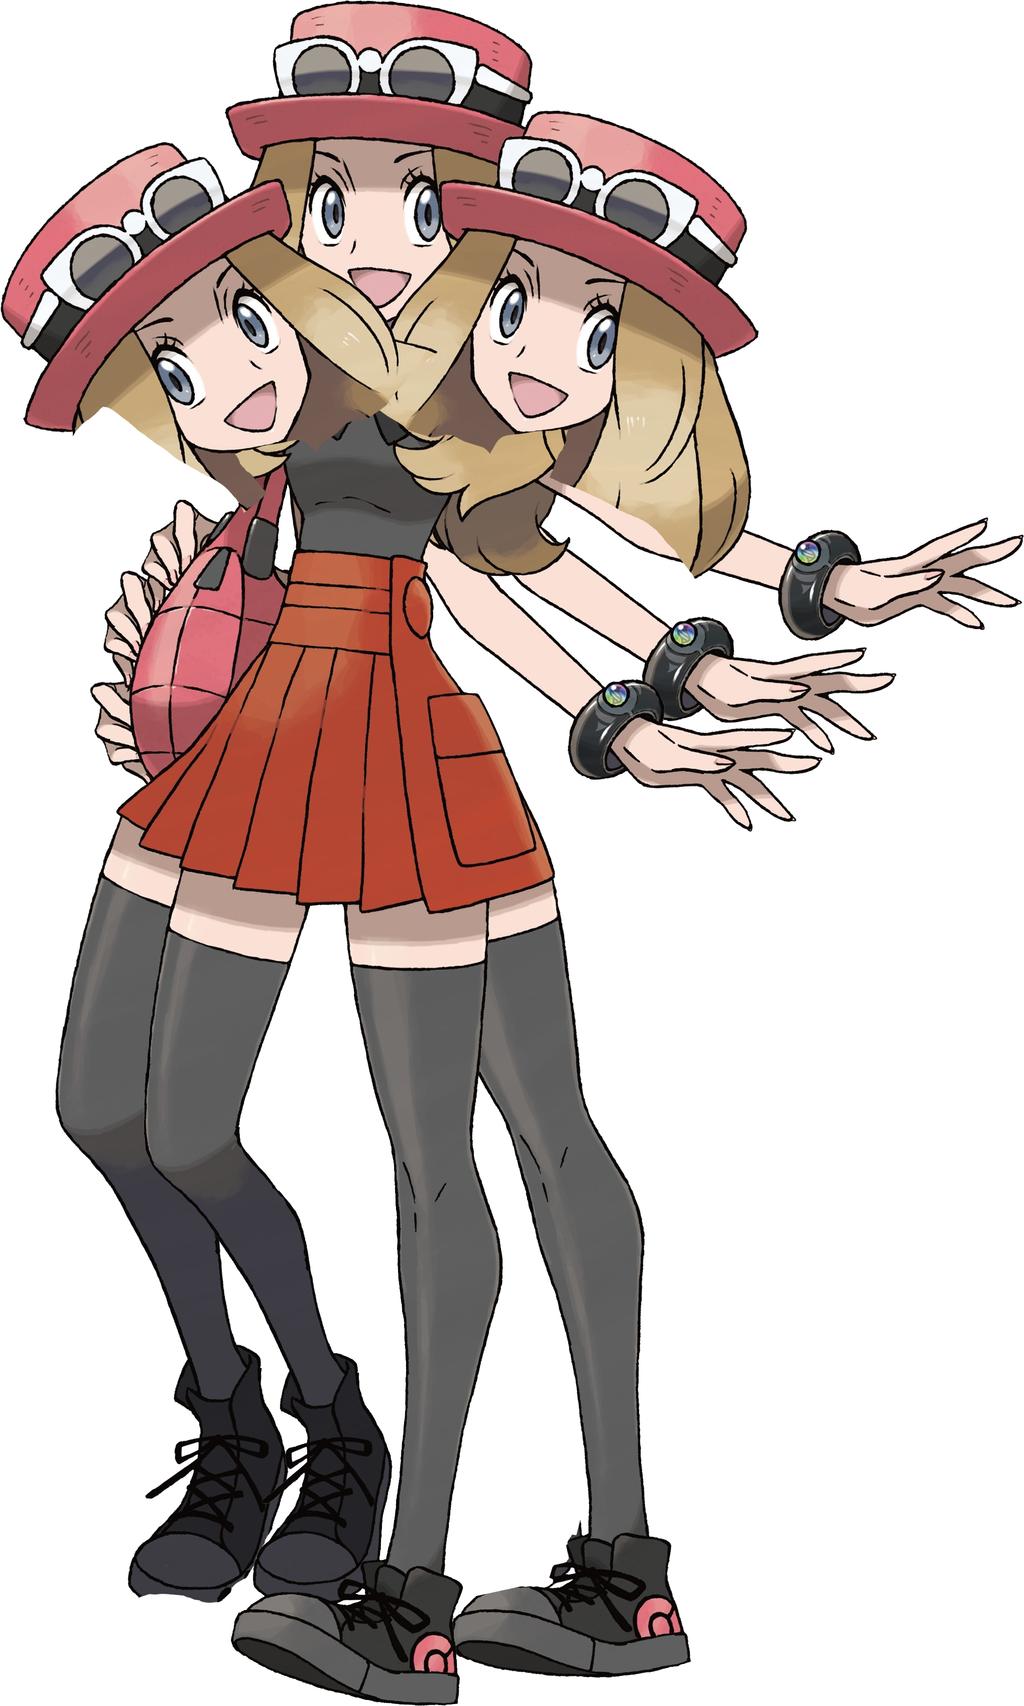 Serena (Pokémon) Image #1516048 - Zerochan Anime Image Board